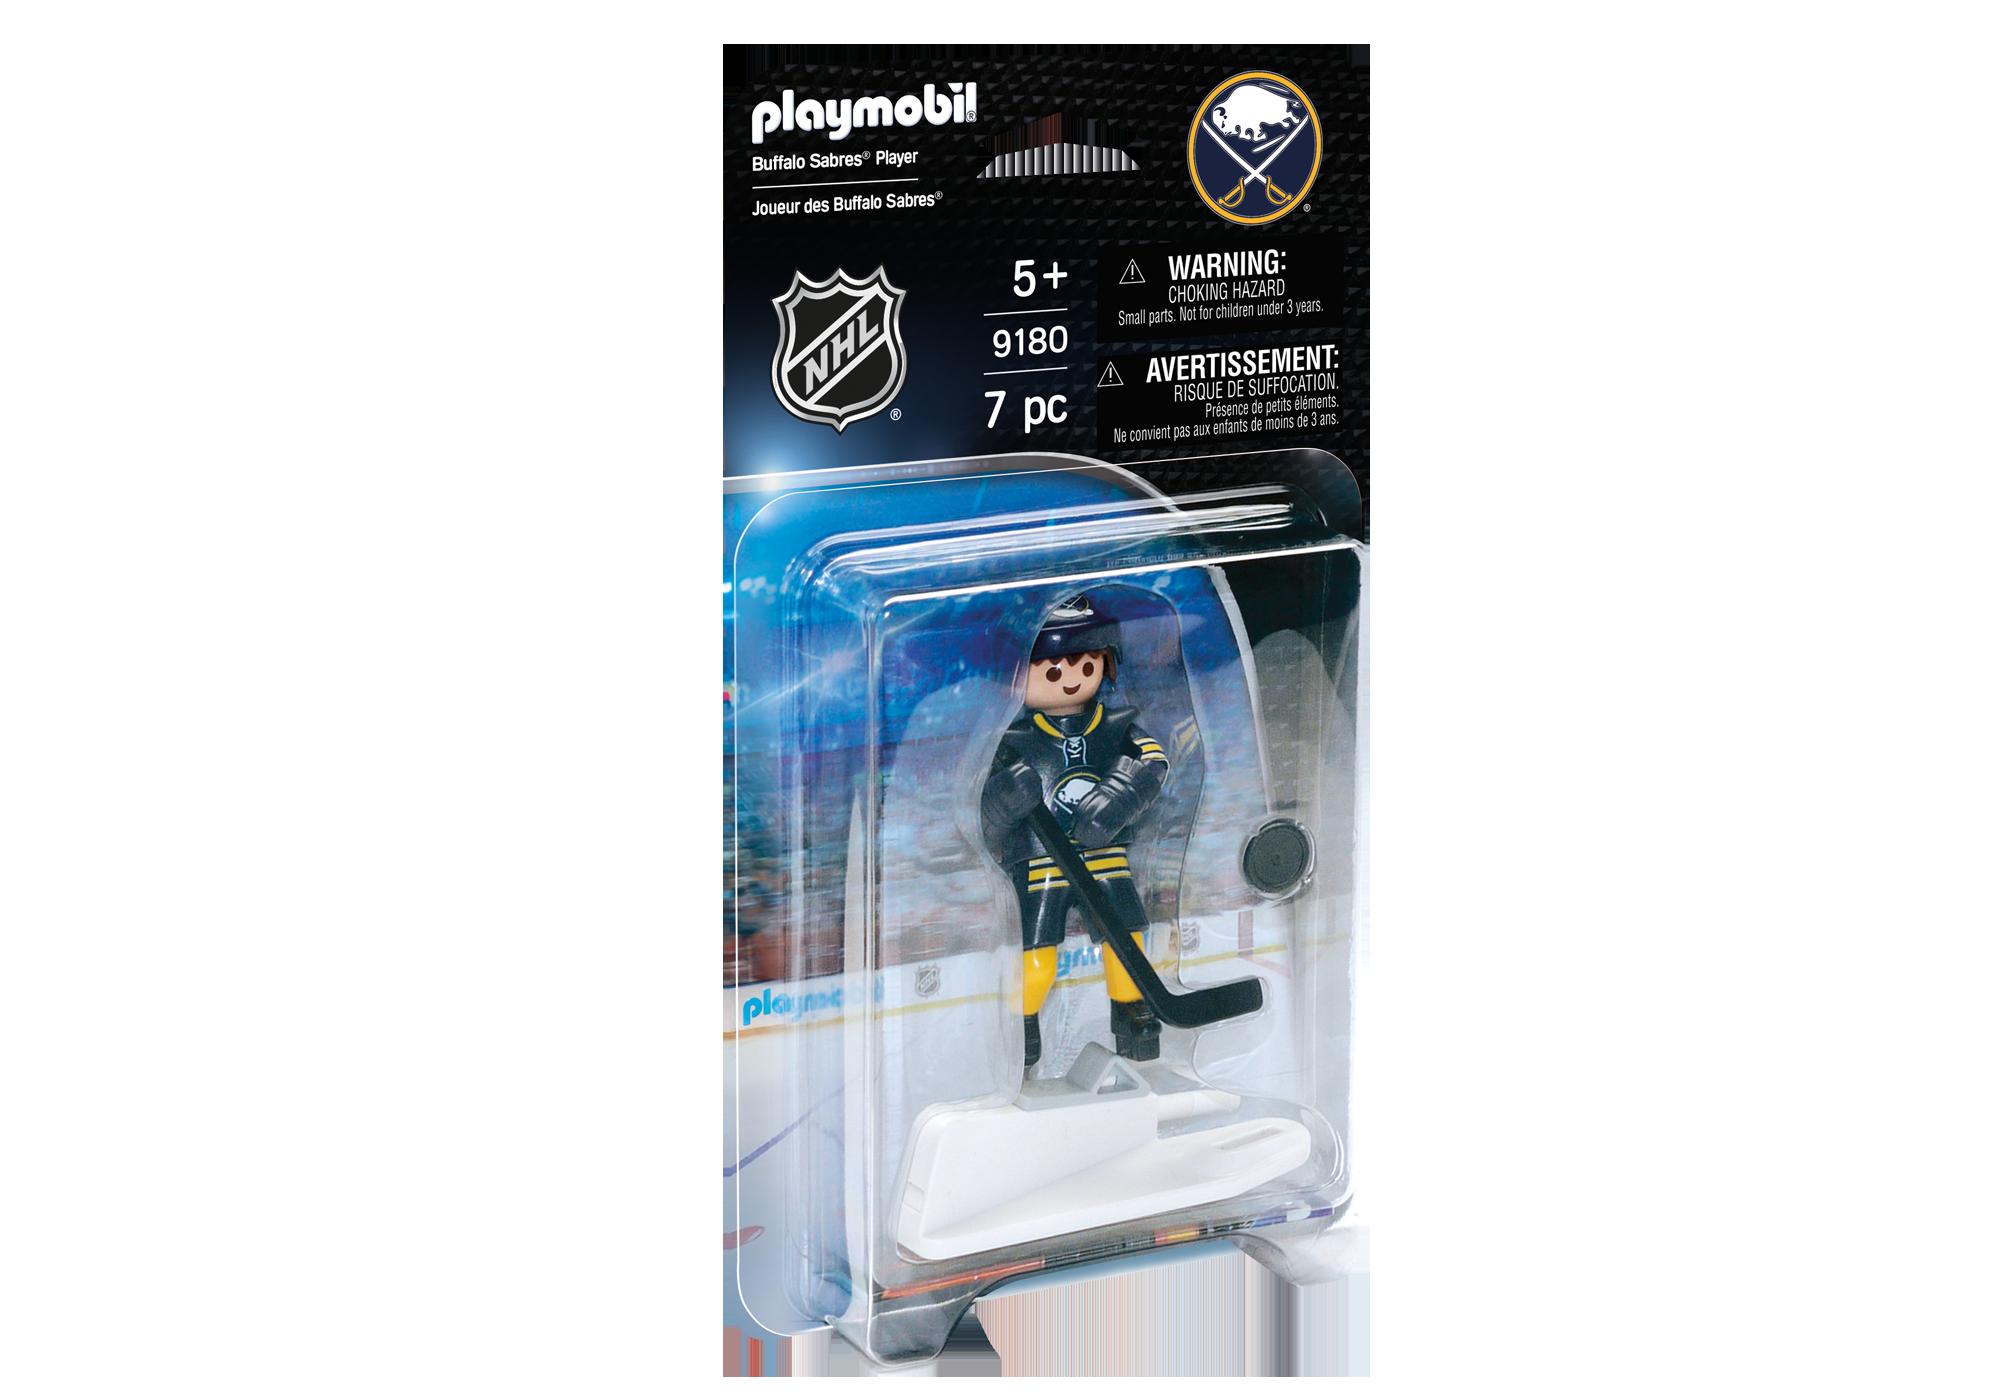 http://media.playmobil.com/i/playmobil/9180_product_box_front/NHL™ Buffalo Sabres™ Player